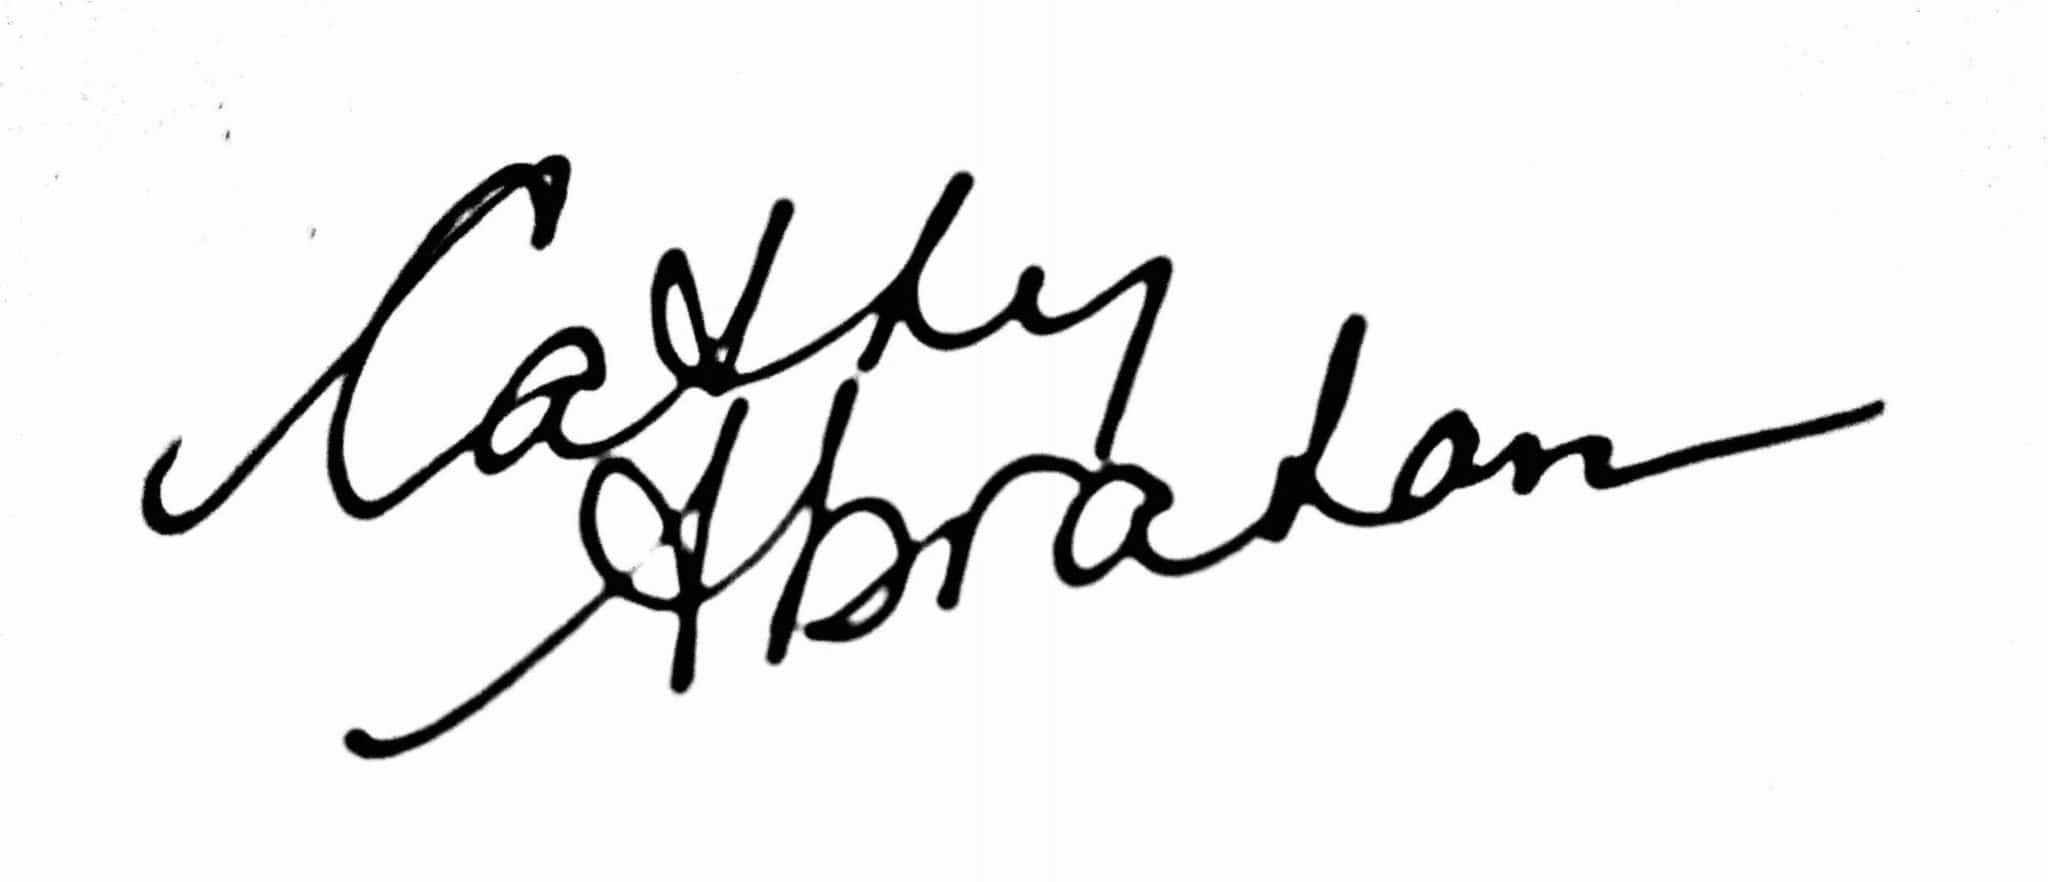 cathy abraham signature.jpg.jpg